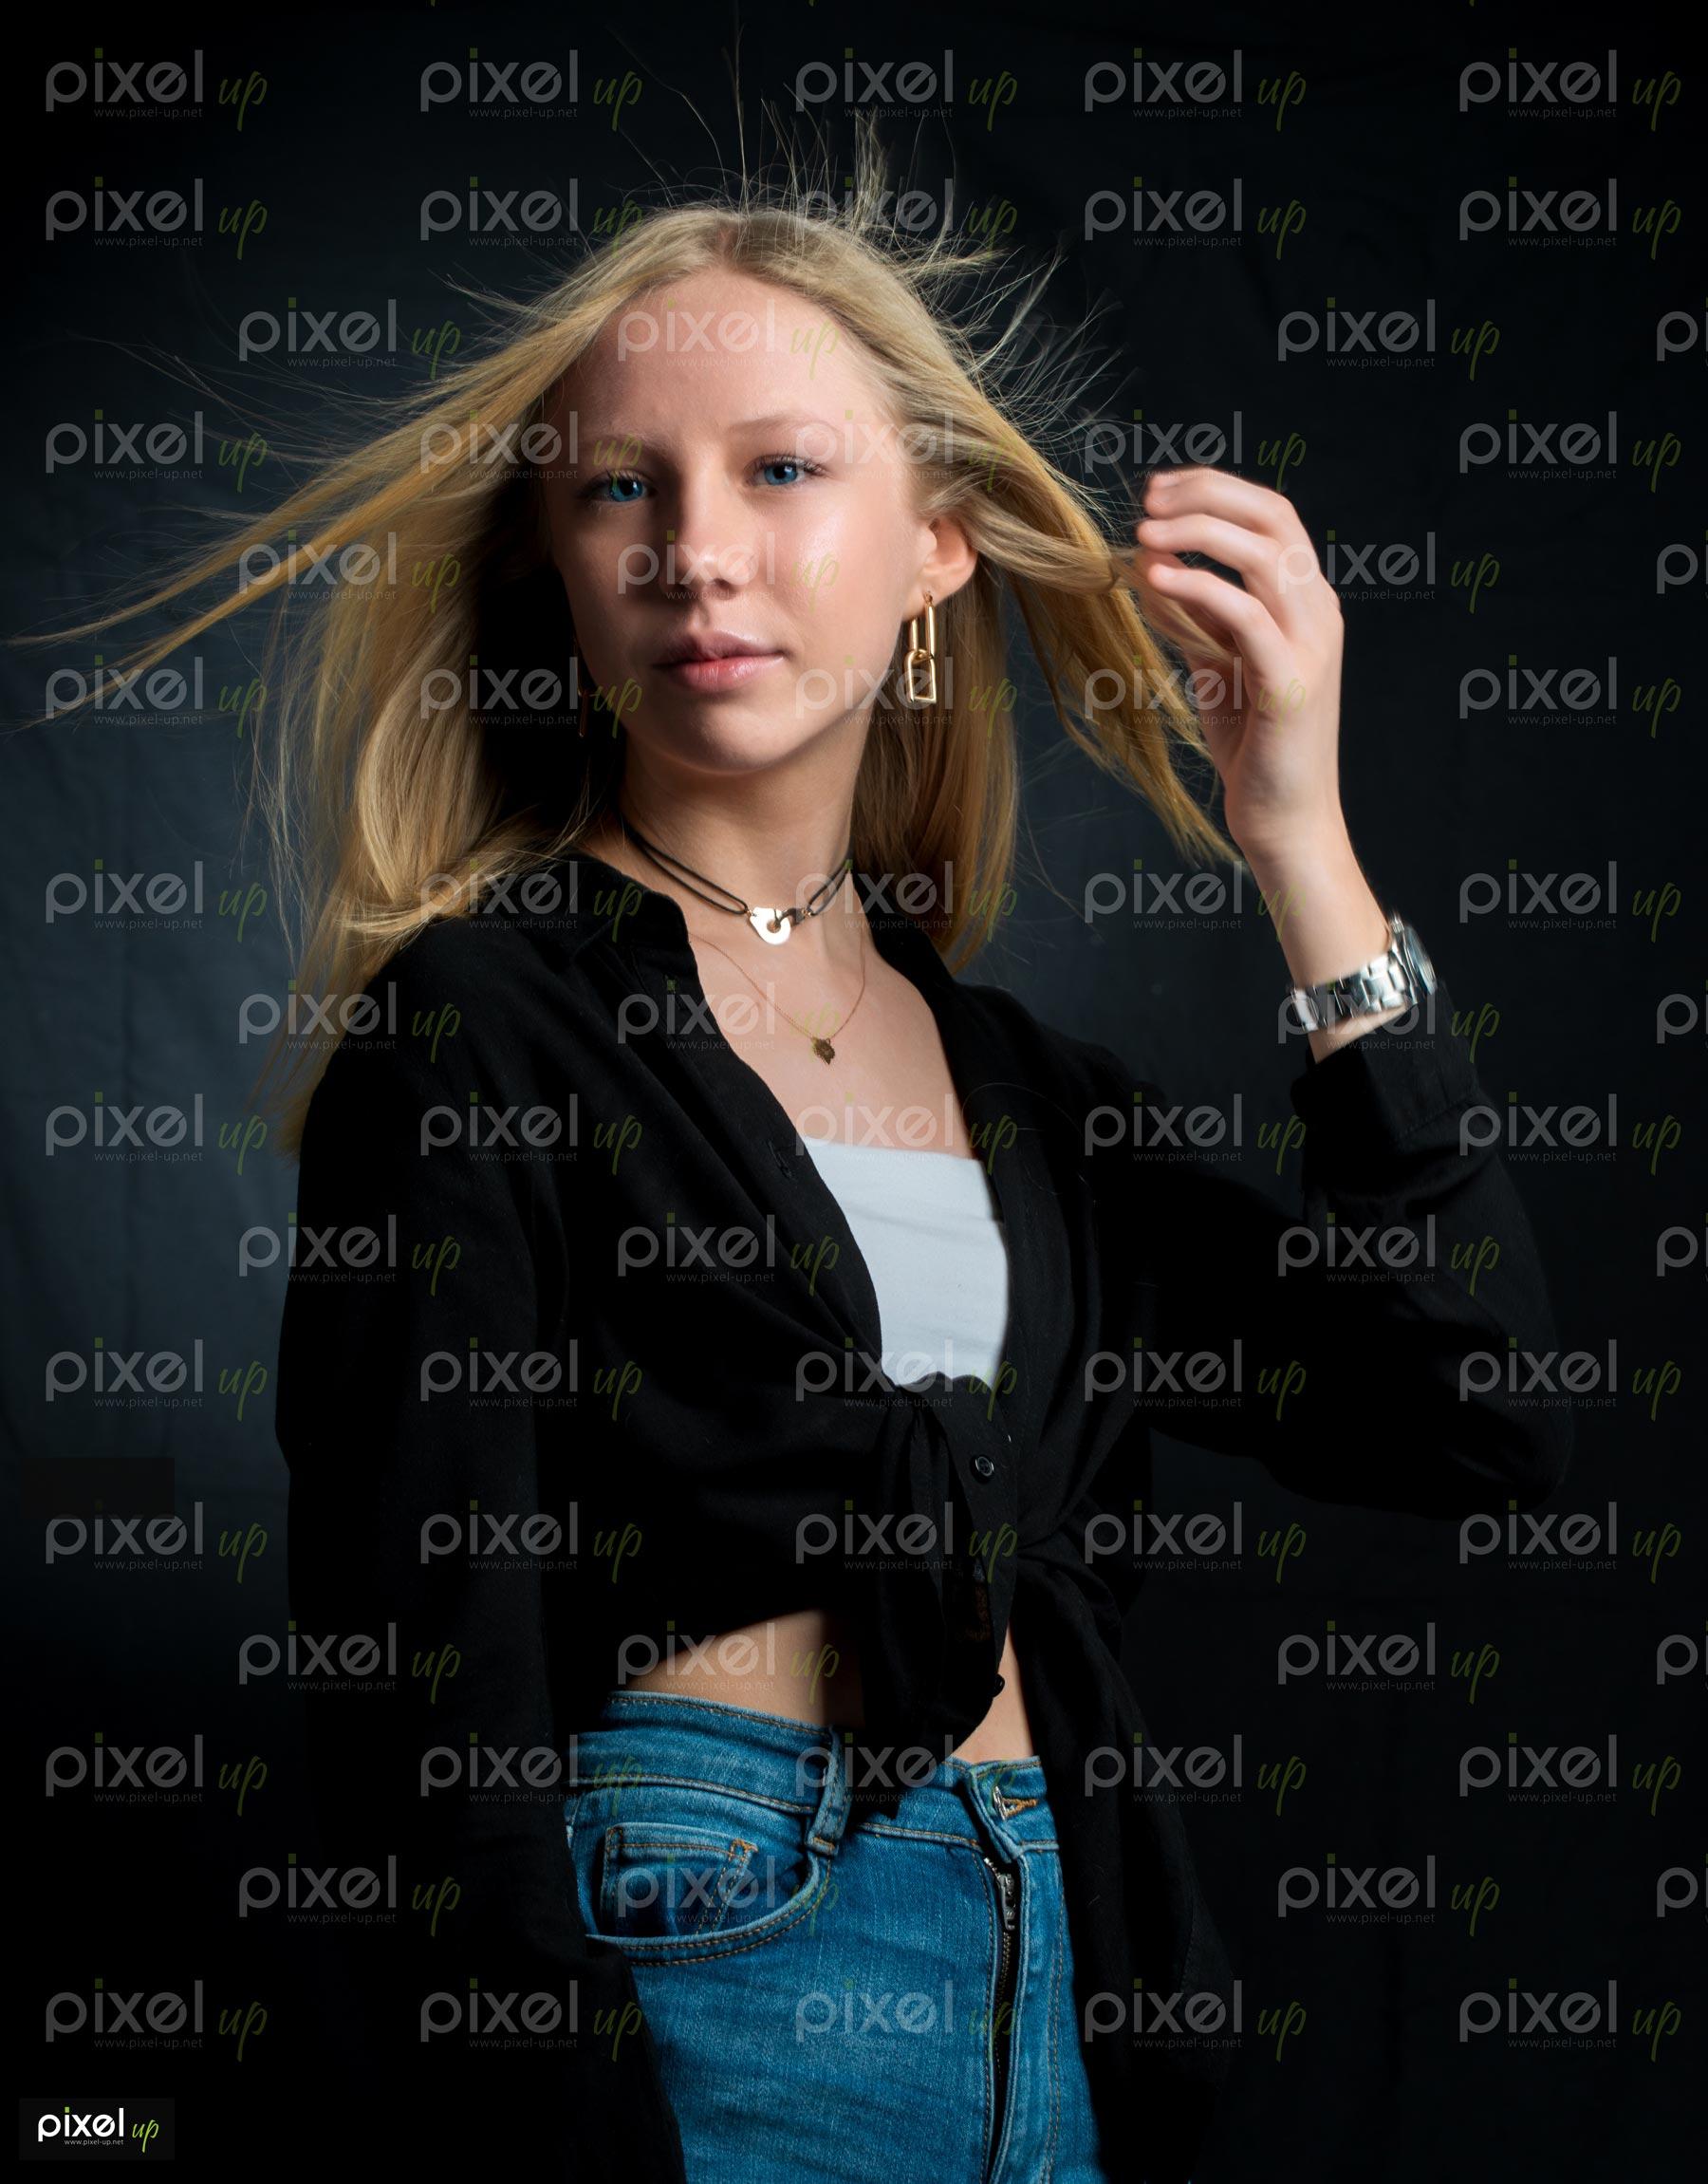 Photographe Pixel up - Photo de Studio